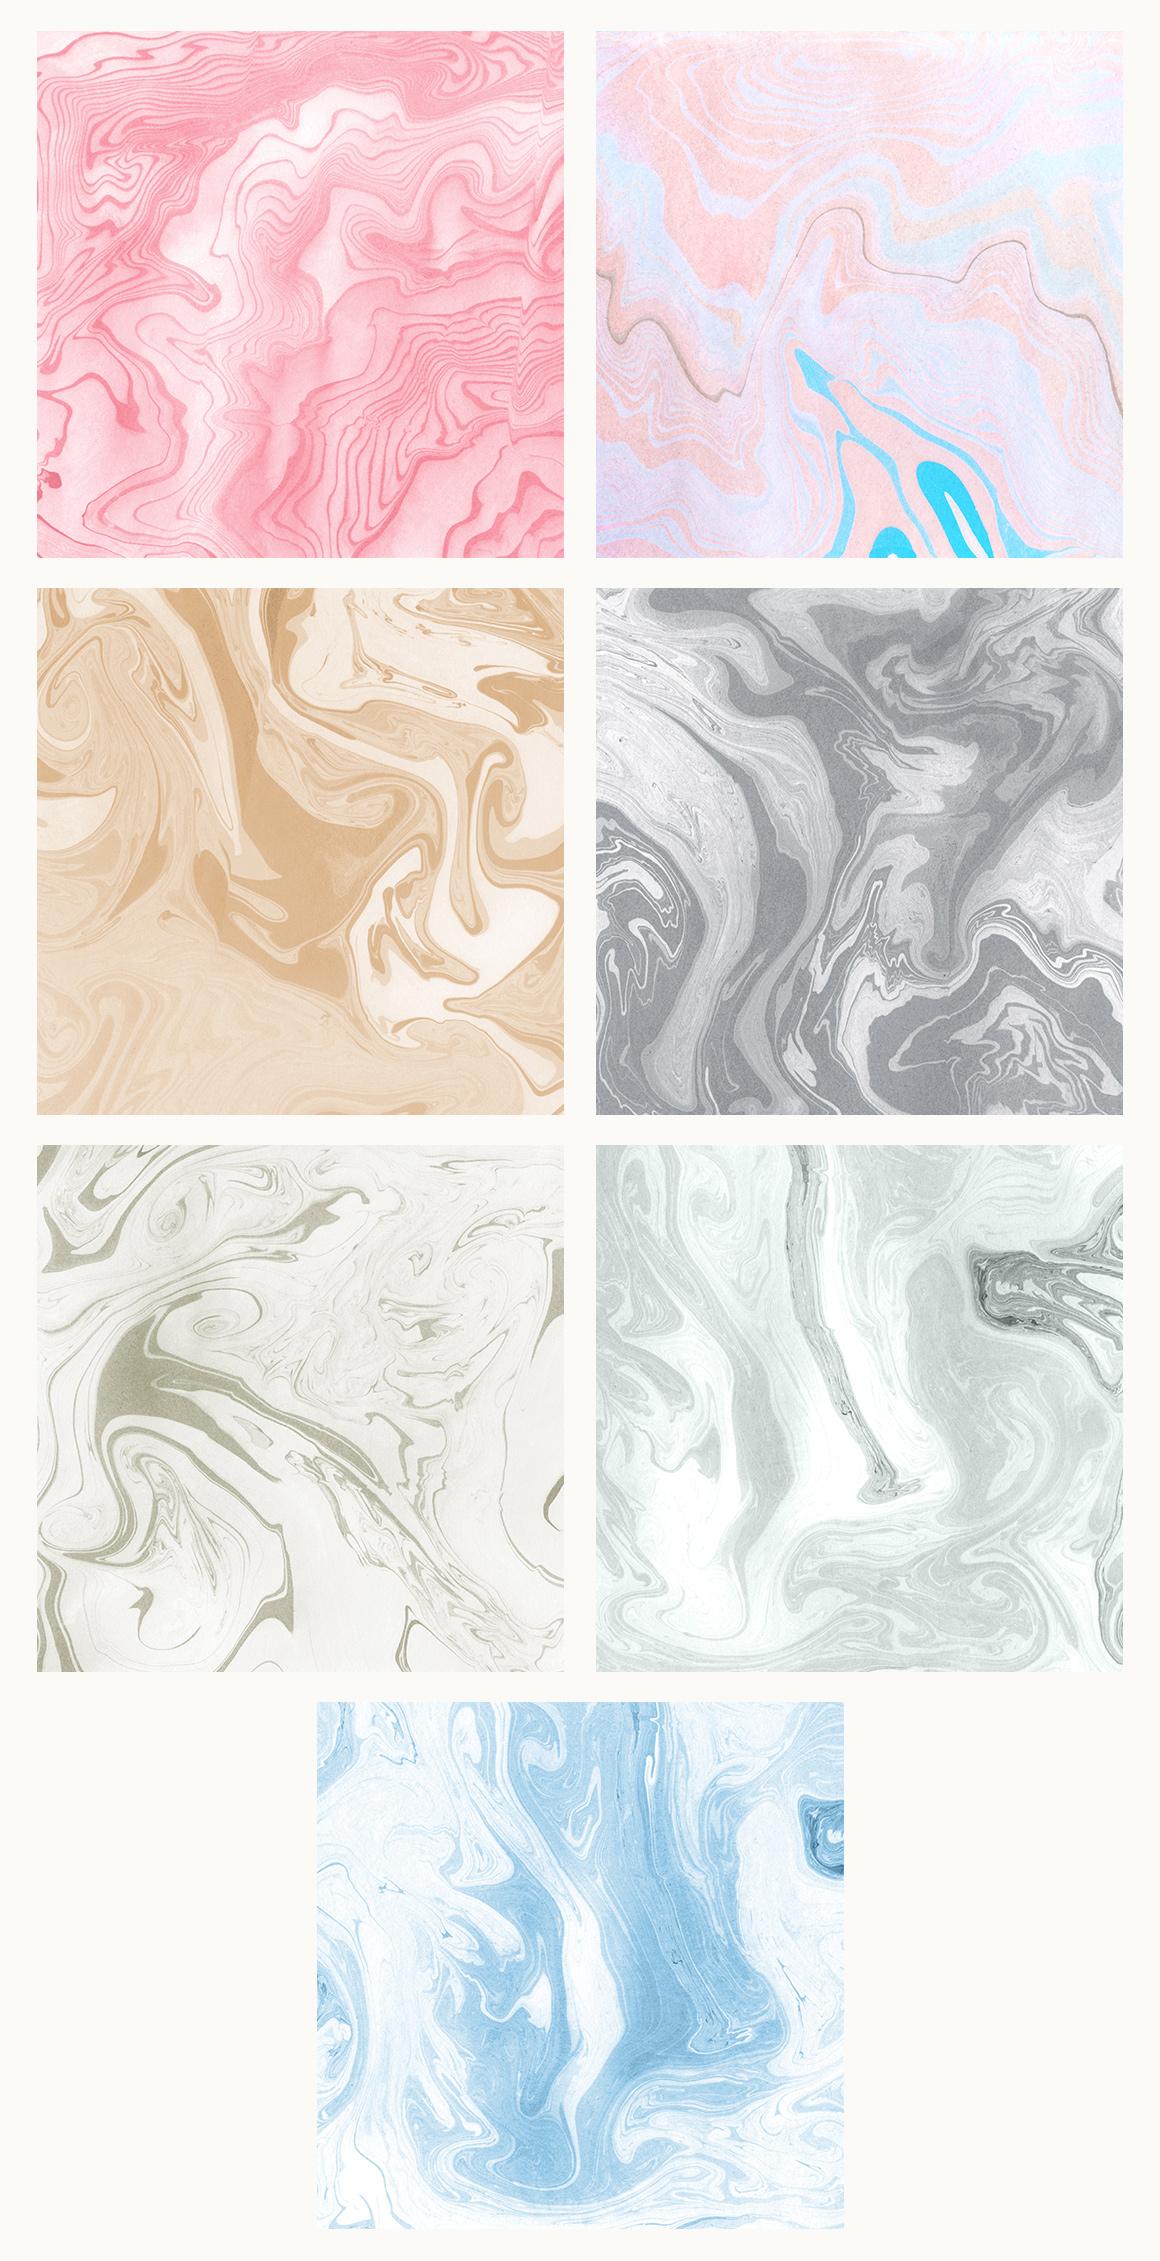 suminagashi-textures-preview-2